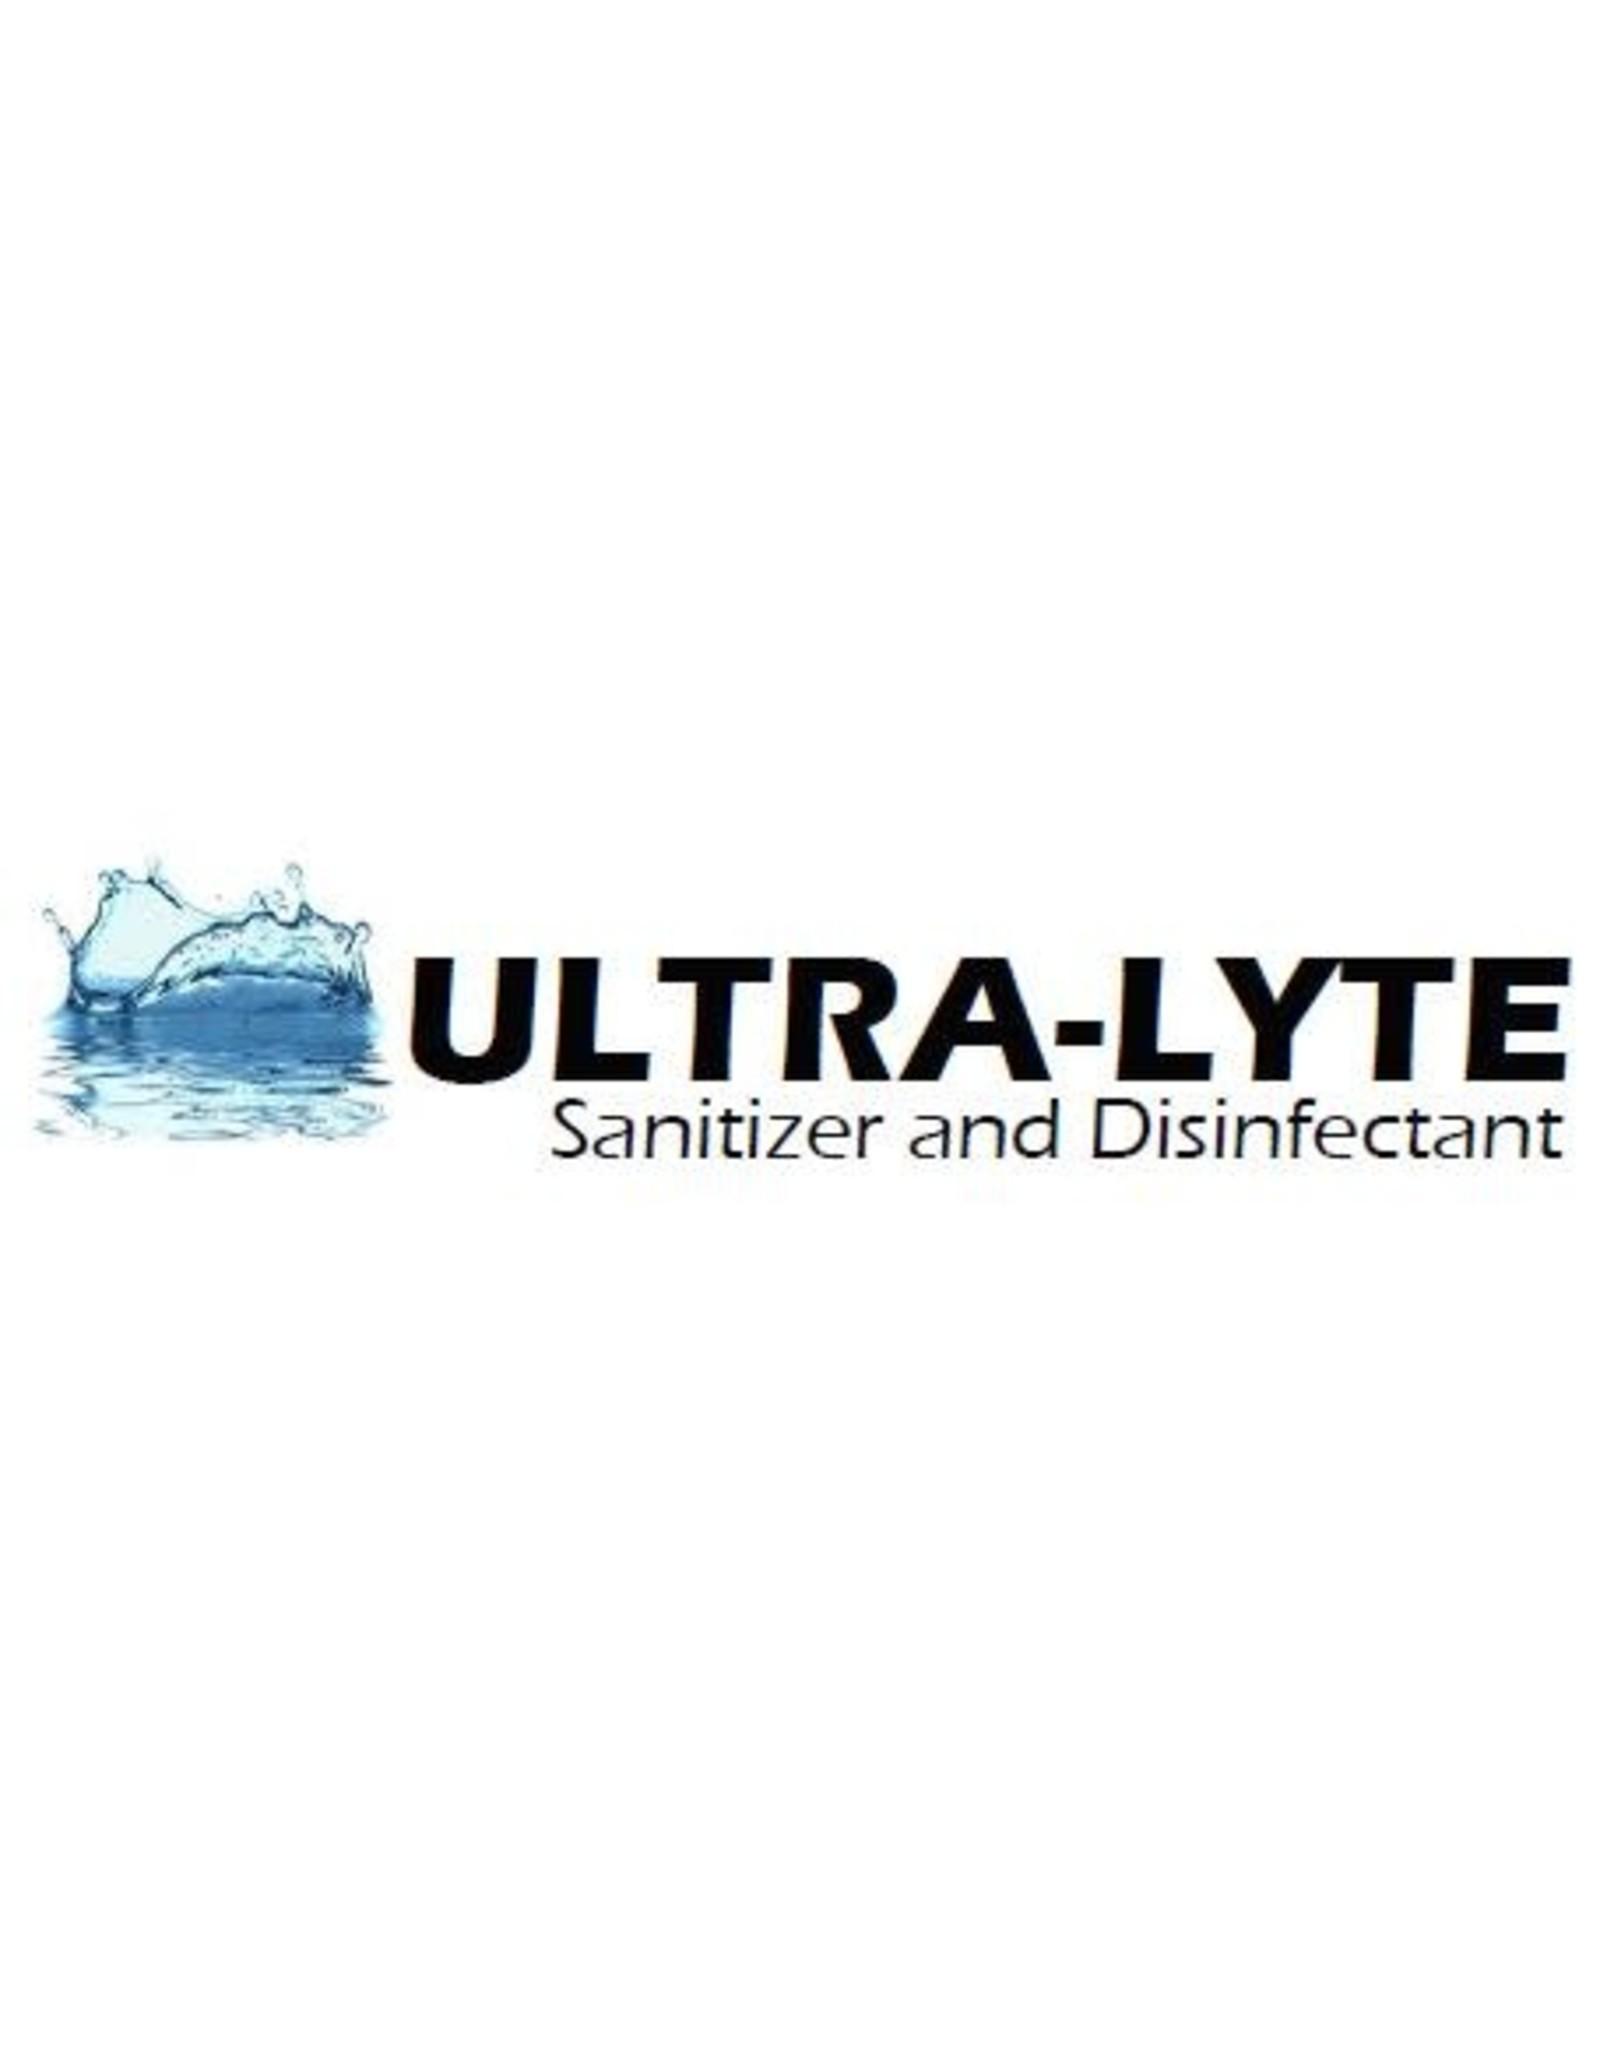 RJ Chemical Ultra-Lyte, 4L Jug, Sanitizer/Disinfectant/Cleaner